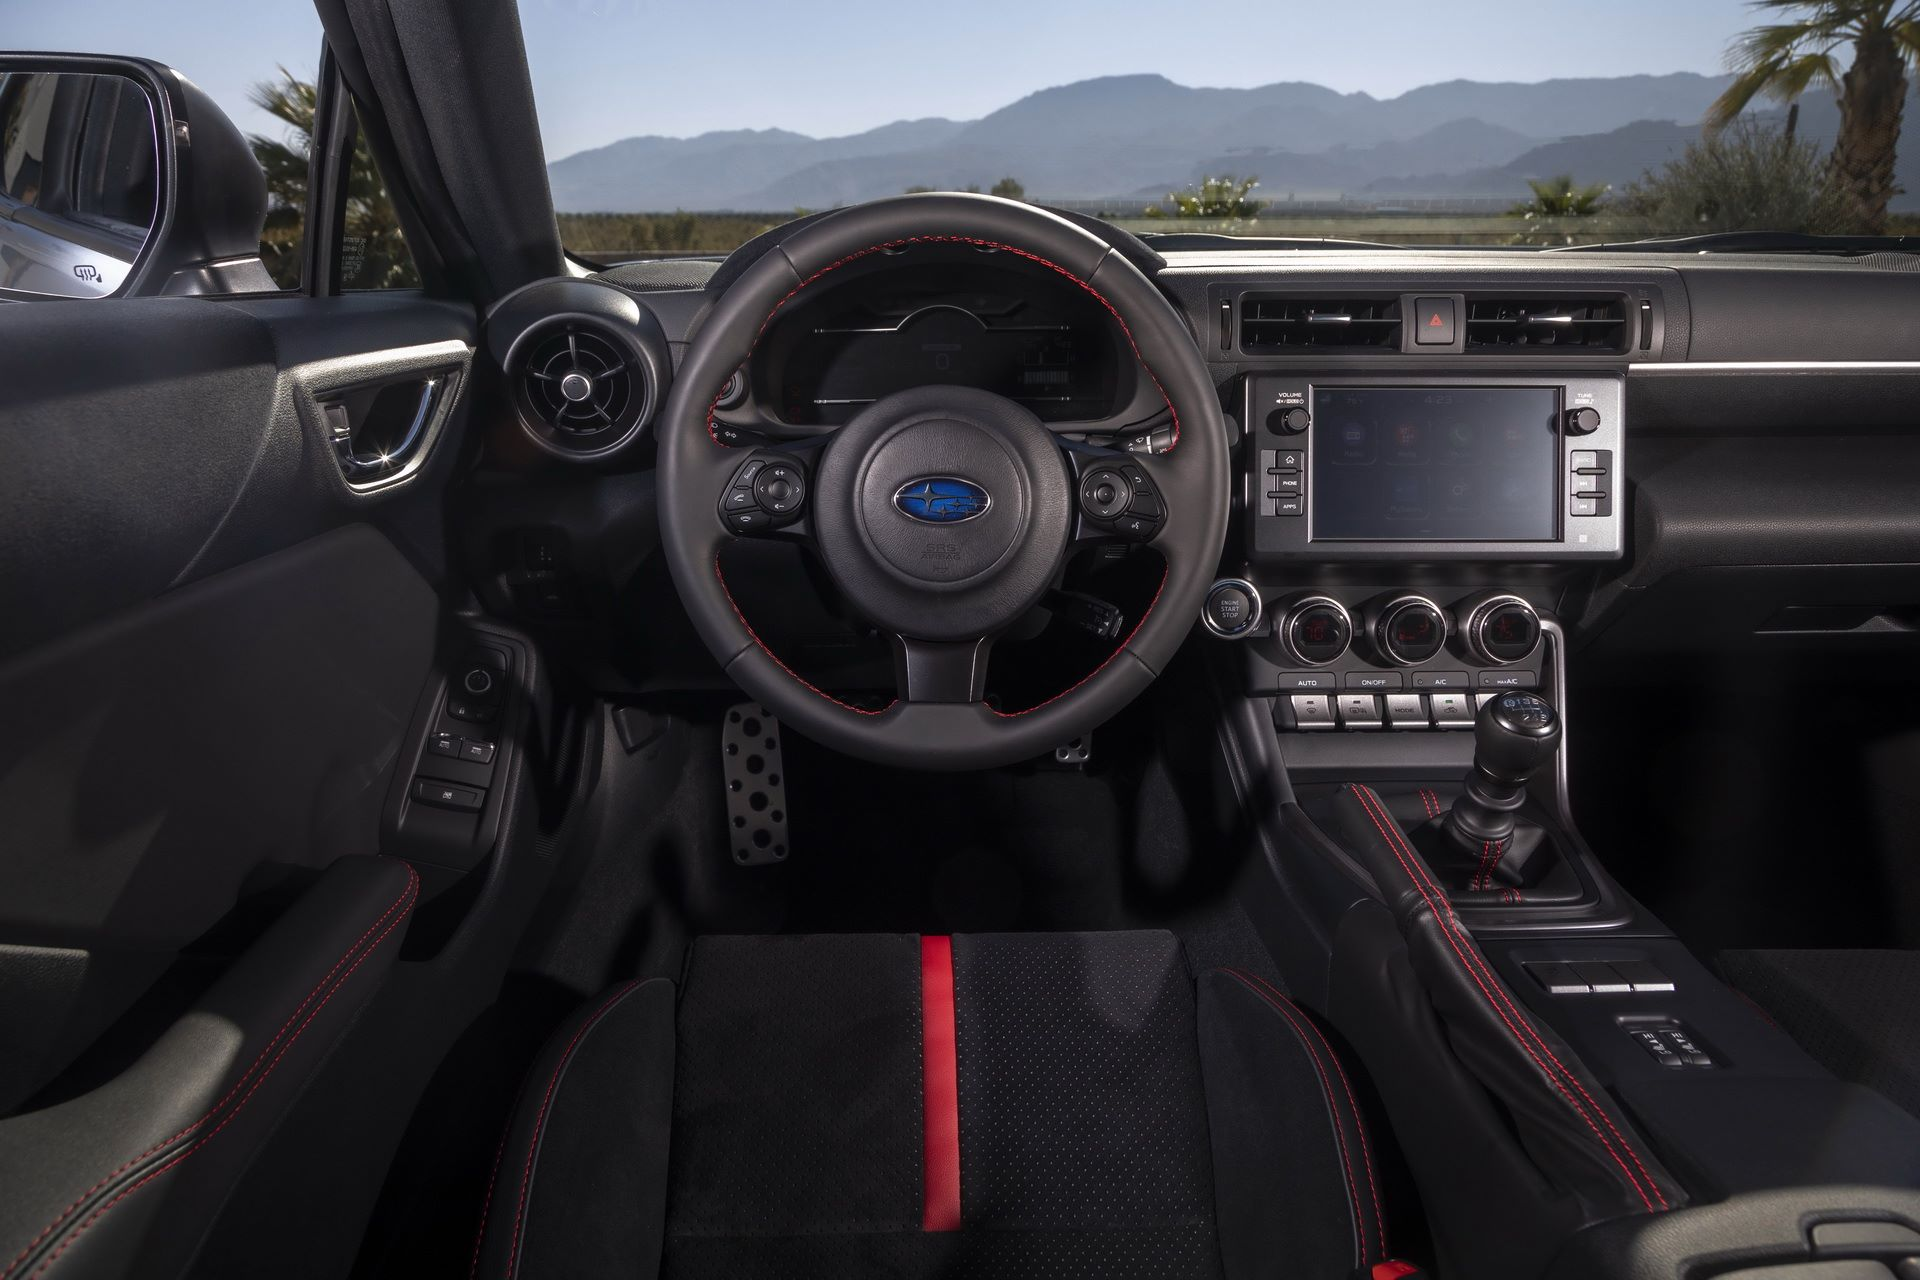 2022-Subaru-BRZ-42